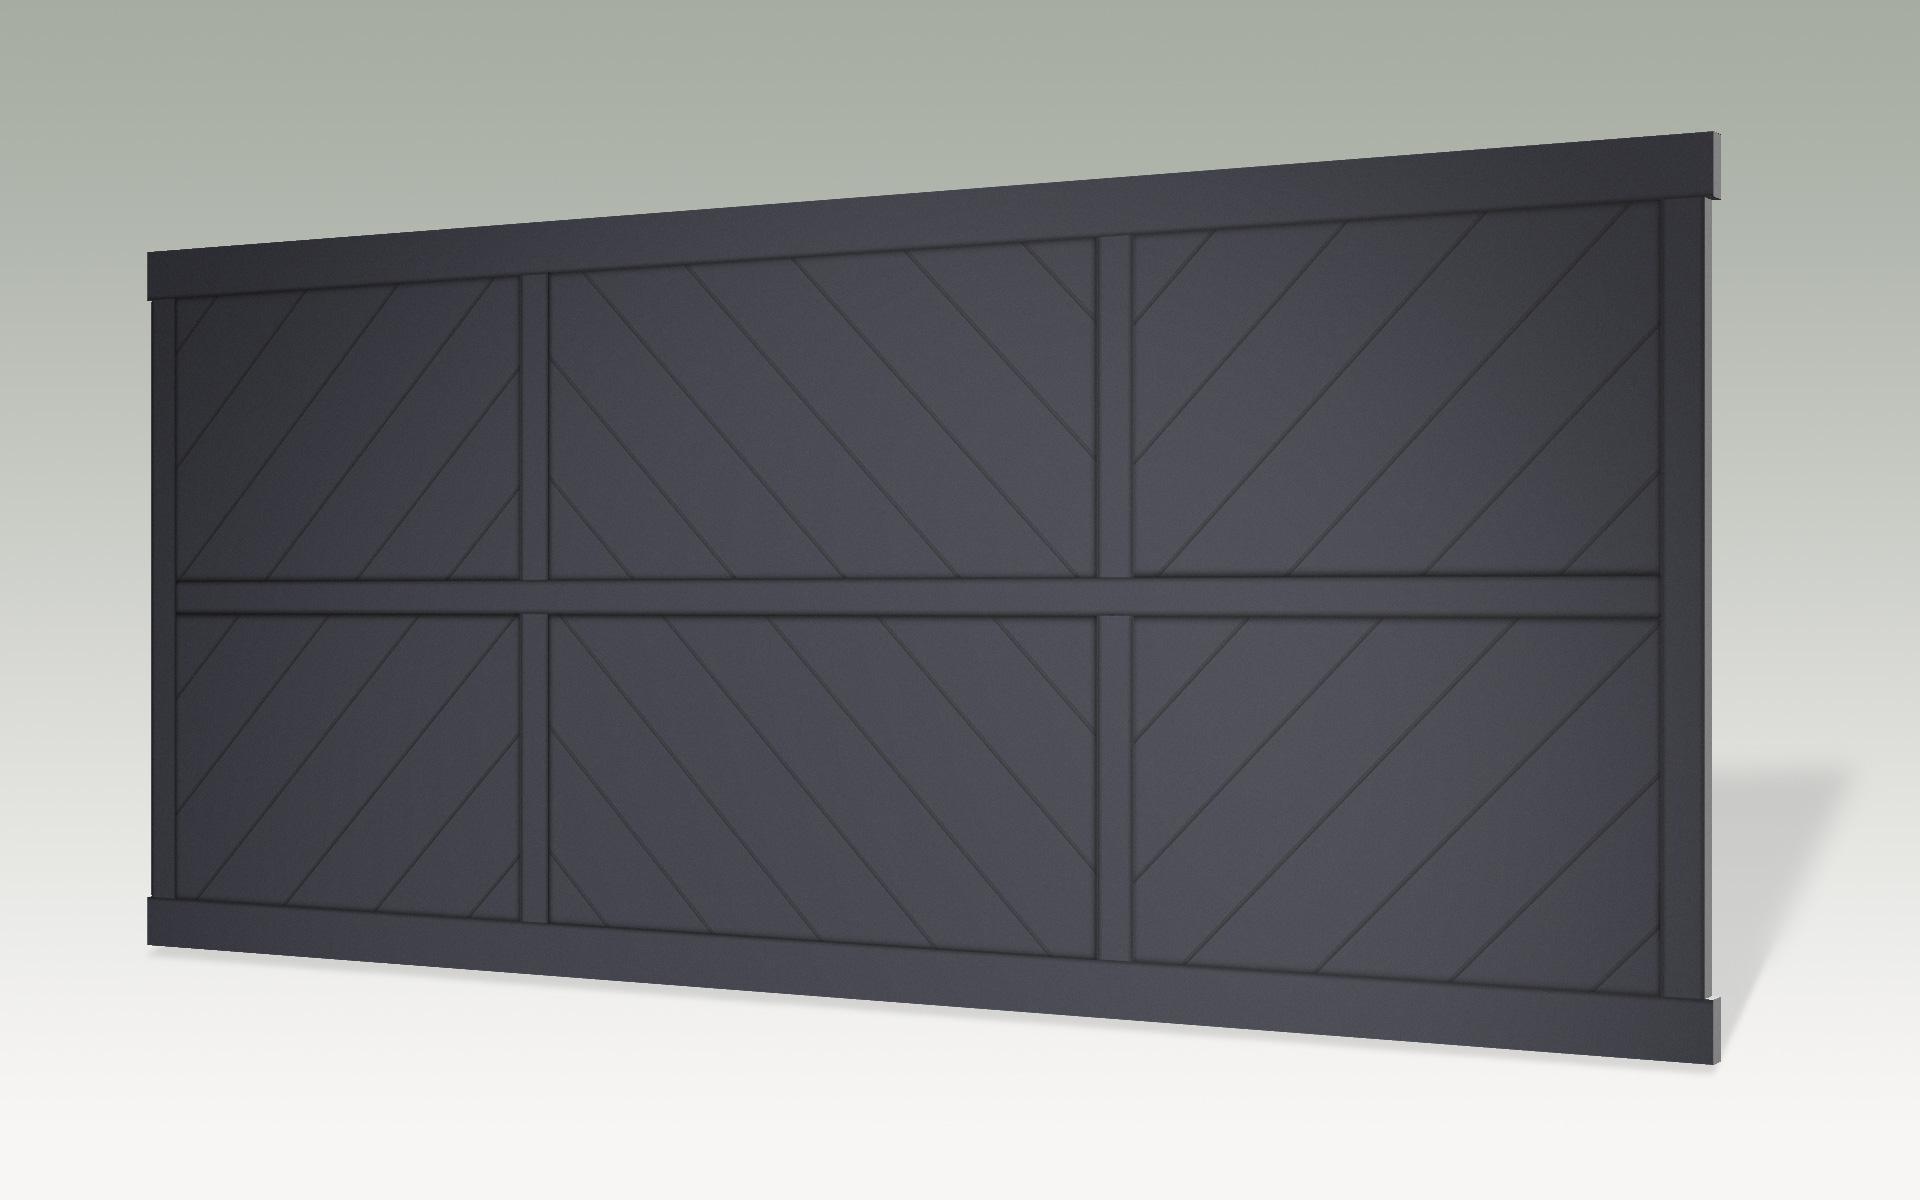 Styledoors ayloporta classic c775